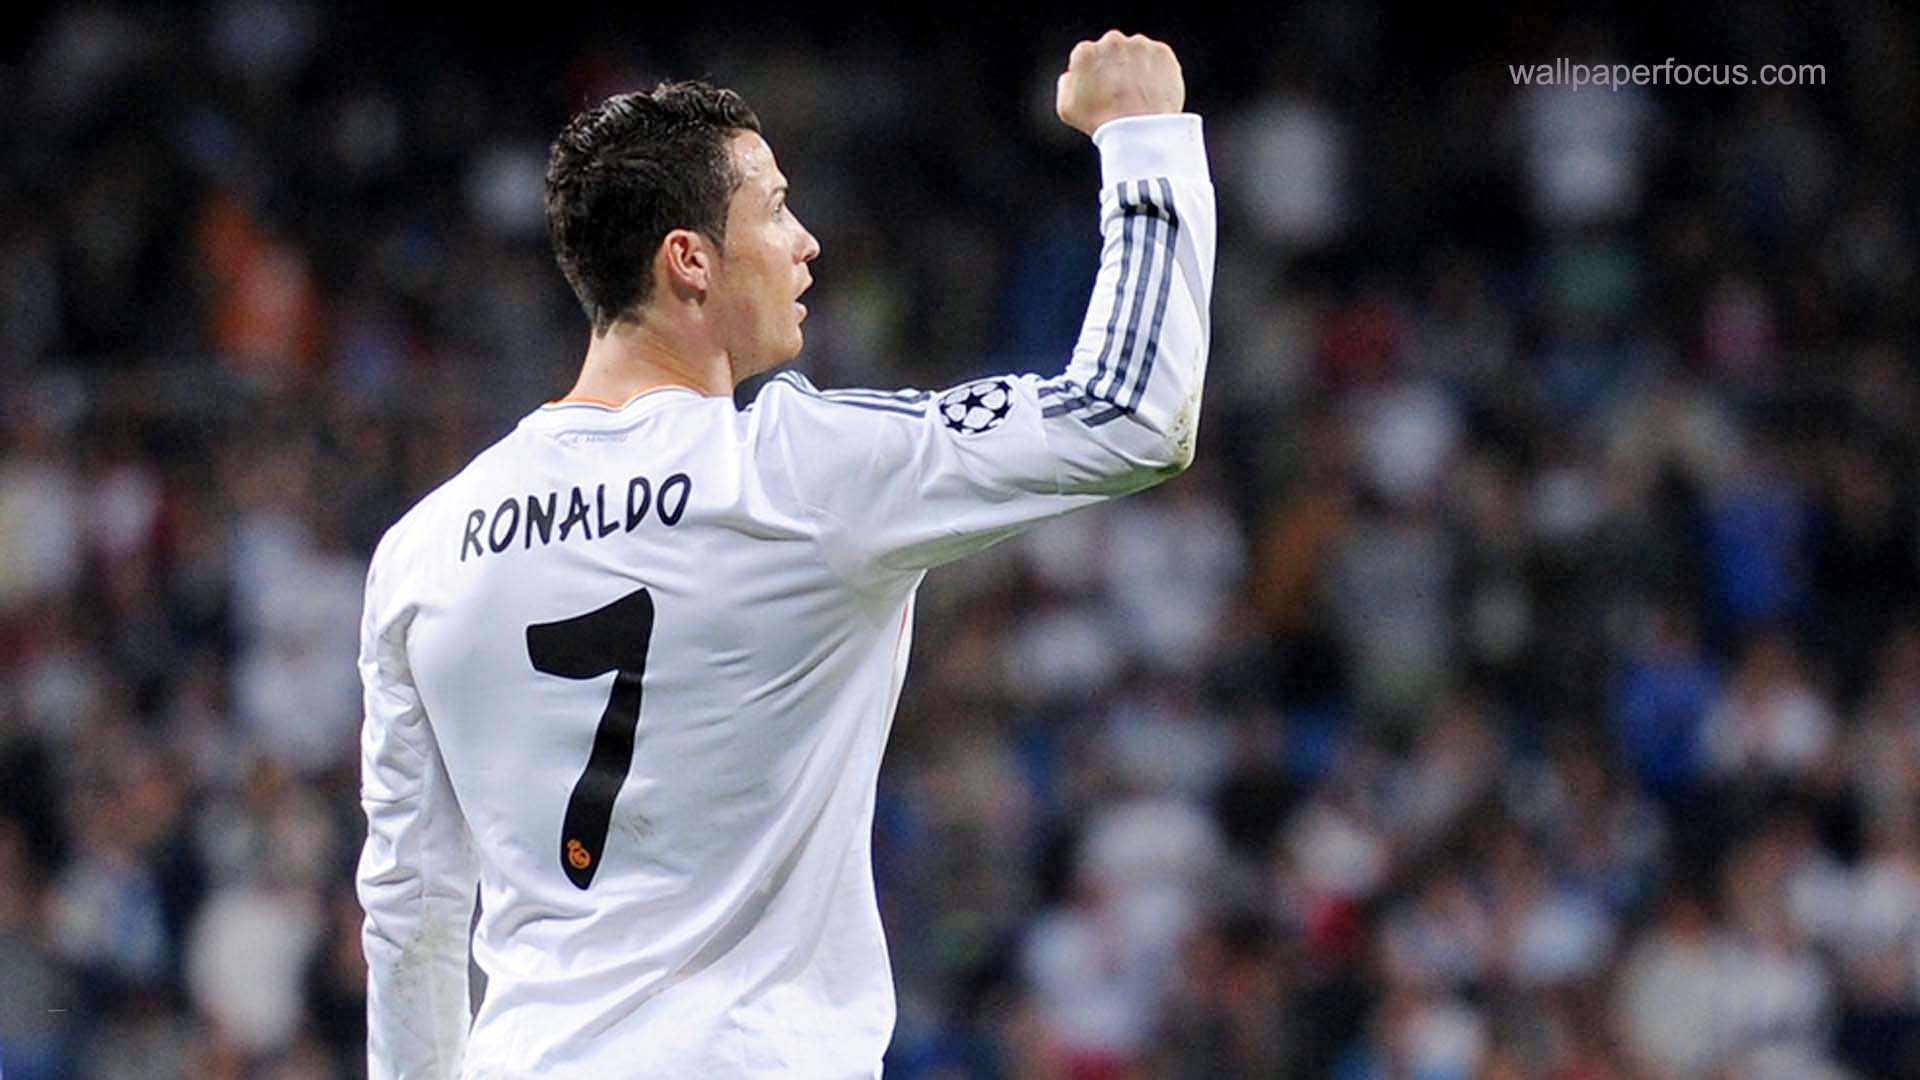 FunMozar – Cristiano Ronaldo Wallpapers Part 2